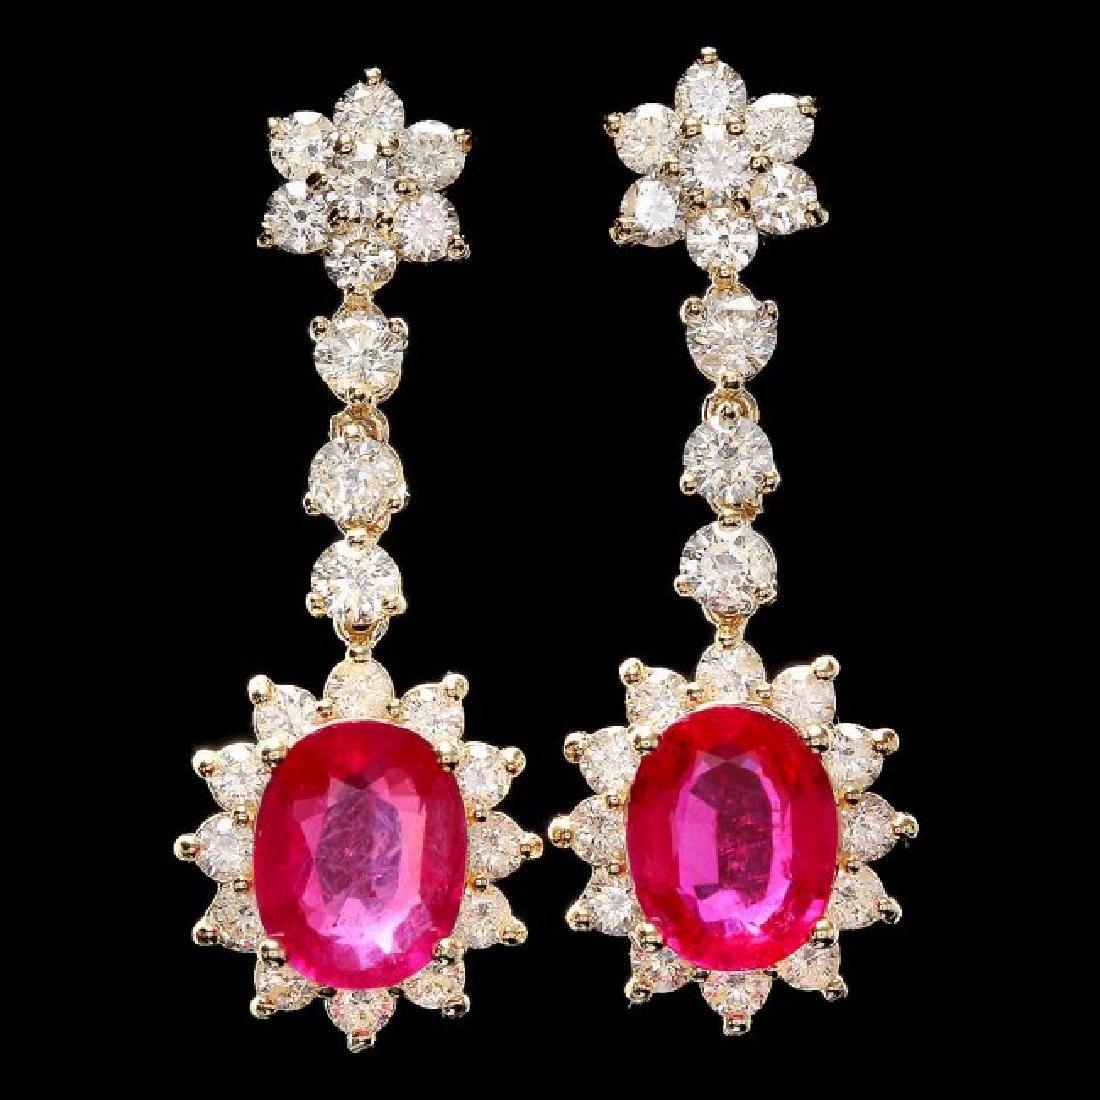 14k Gold 6.00ct Ruby 3.0ct Diamond Earrings